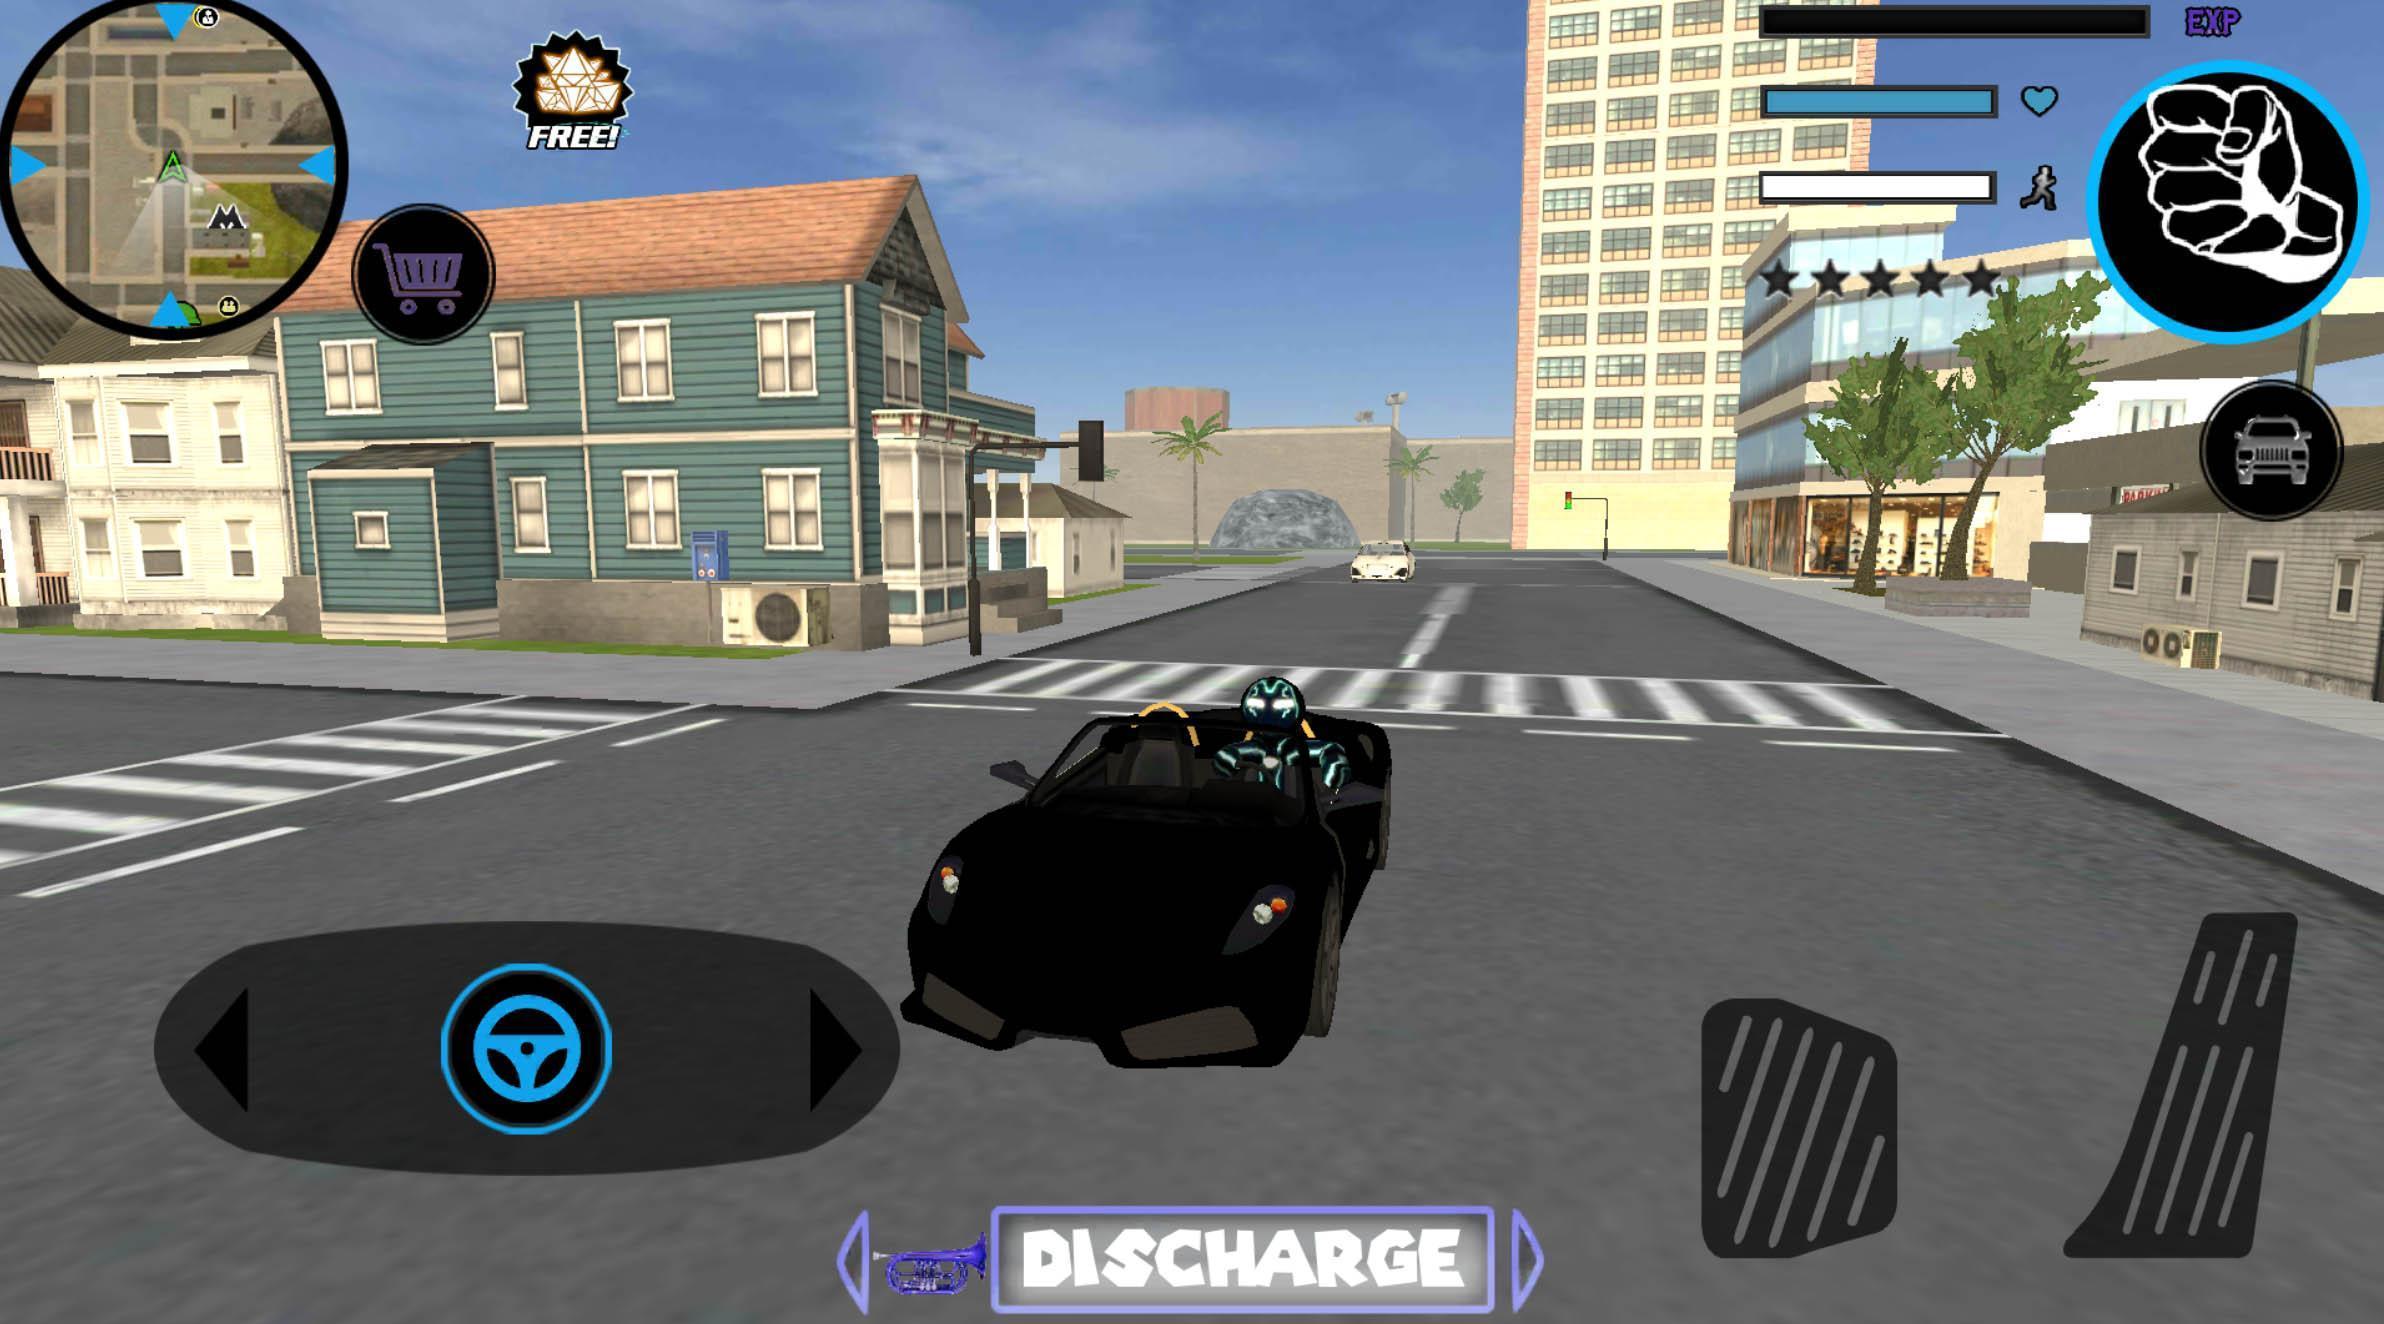 Neon Iron Stickman Rope Hero City Gangstar Mafia 1.6 Screenshot 7